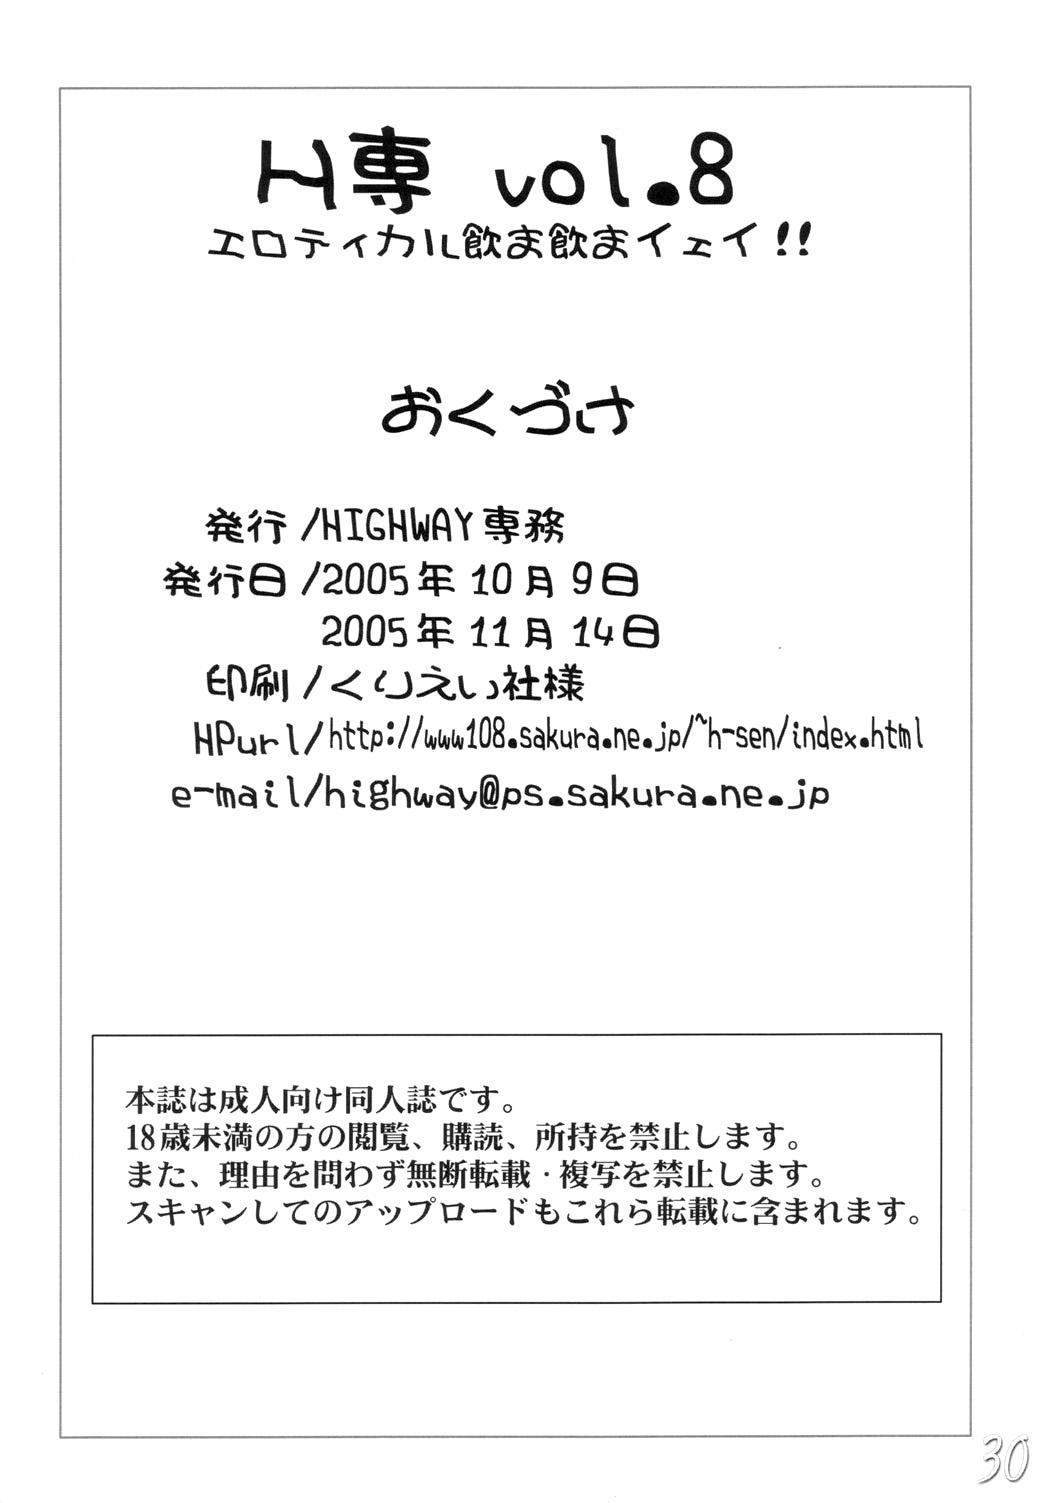 (ComiComi8) [HIGHWAY-SENMU (Maban, Saikoubi)] H-Sen vol. 8 -Erotical noma noma iei!!- (BLEACH) [English] [H4chan] 26